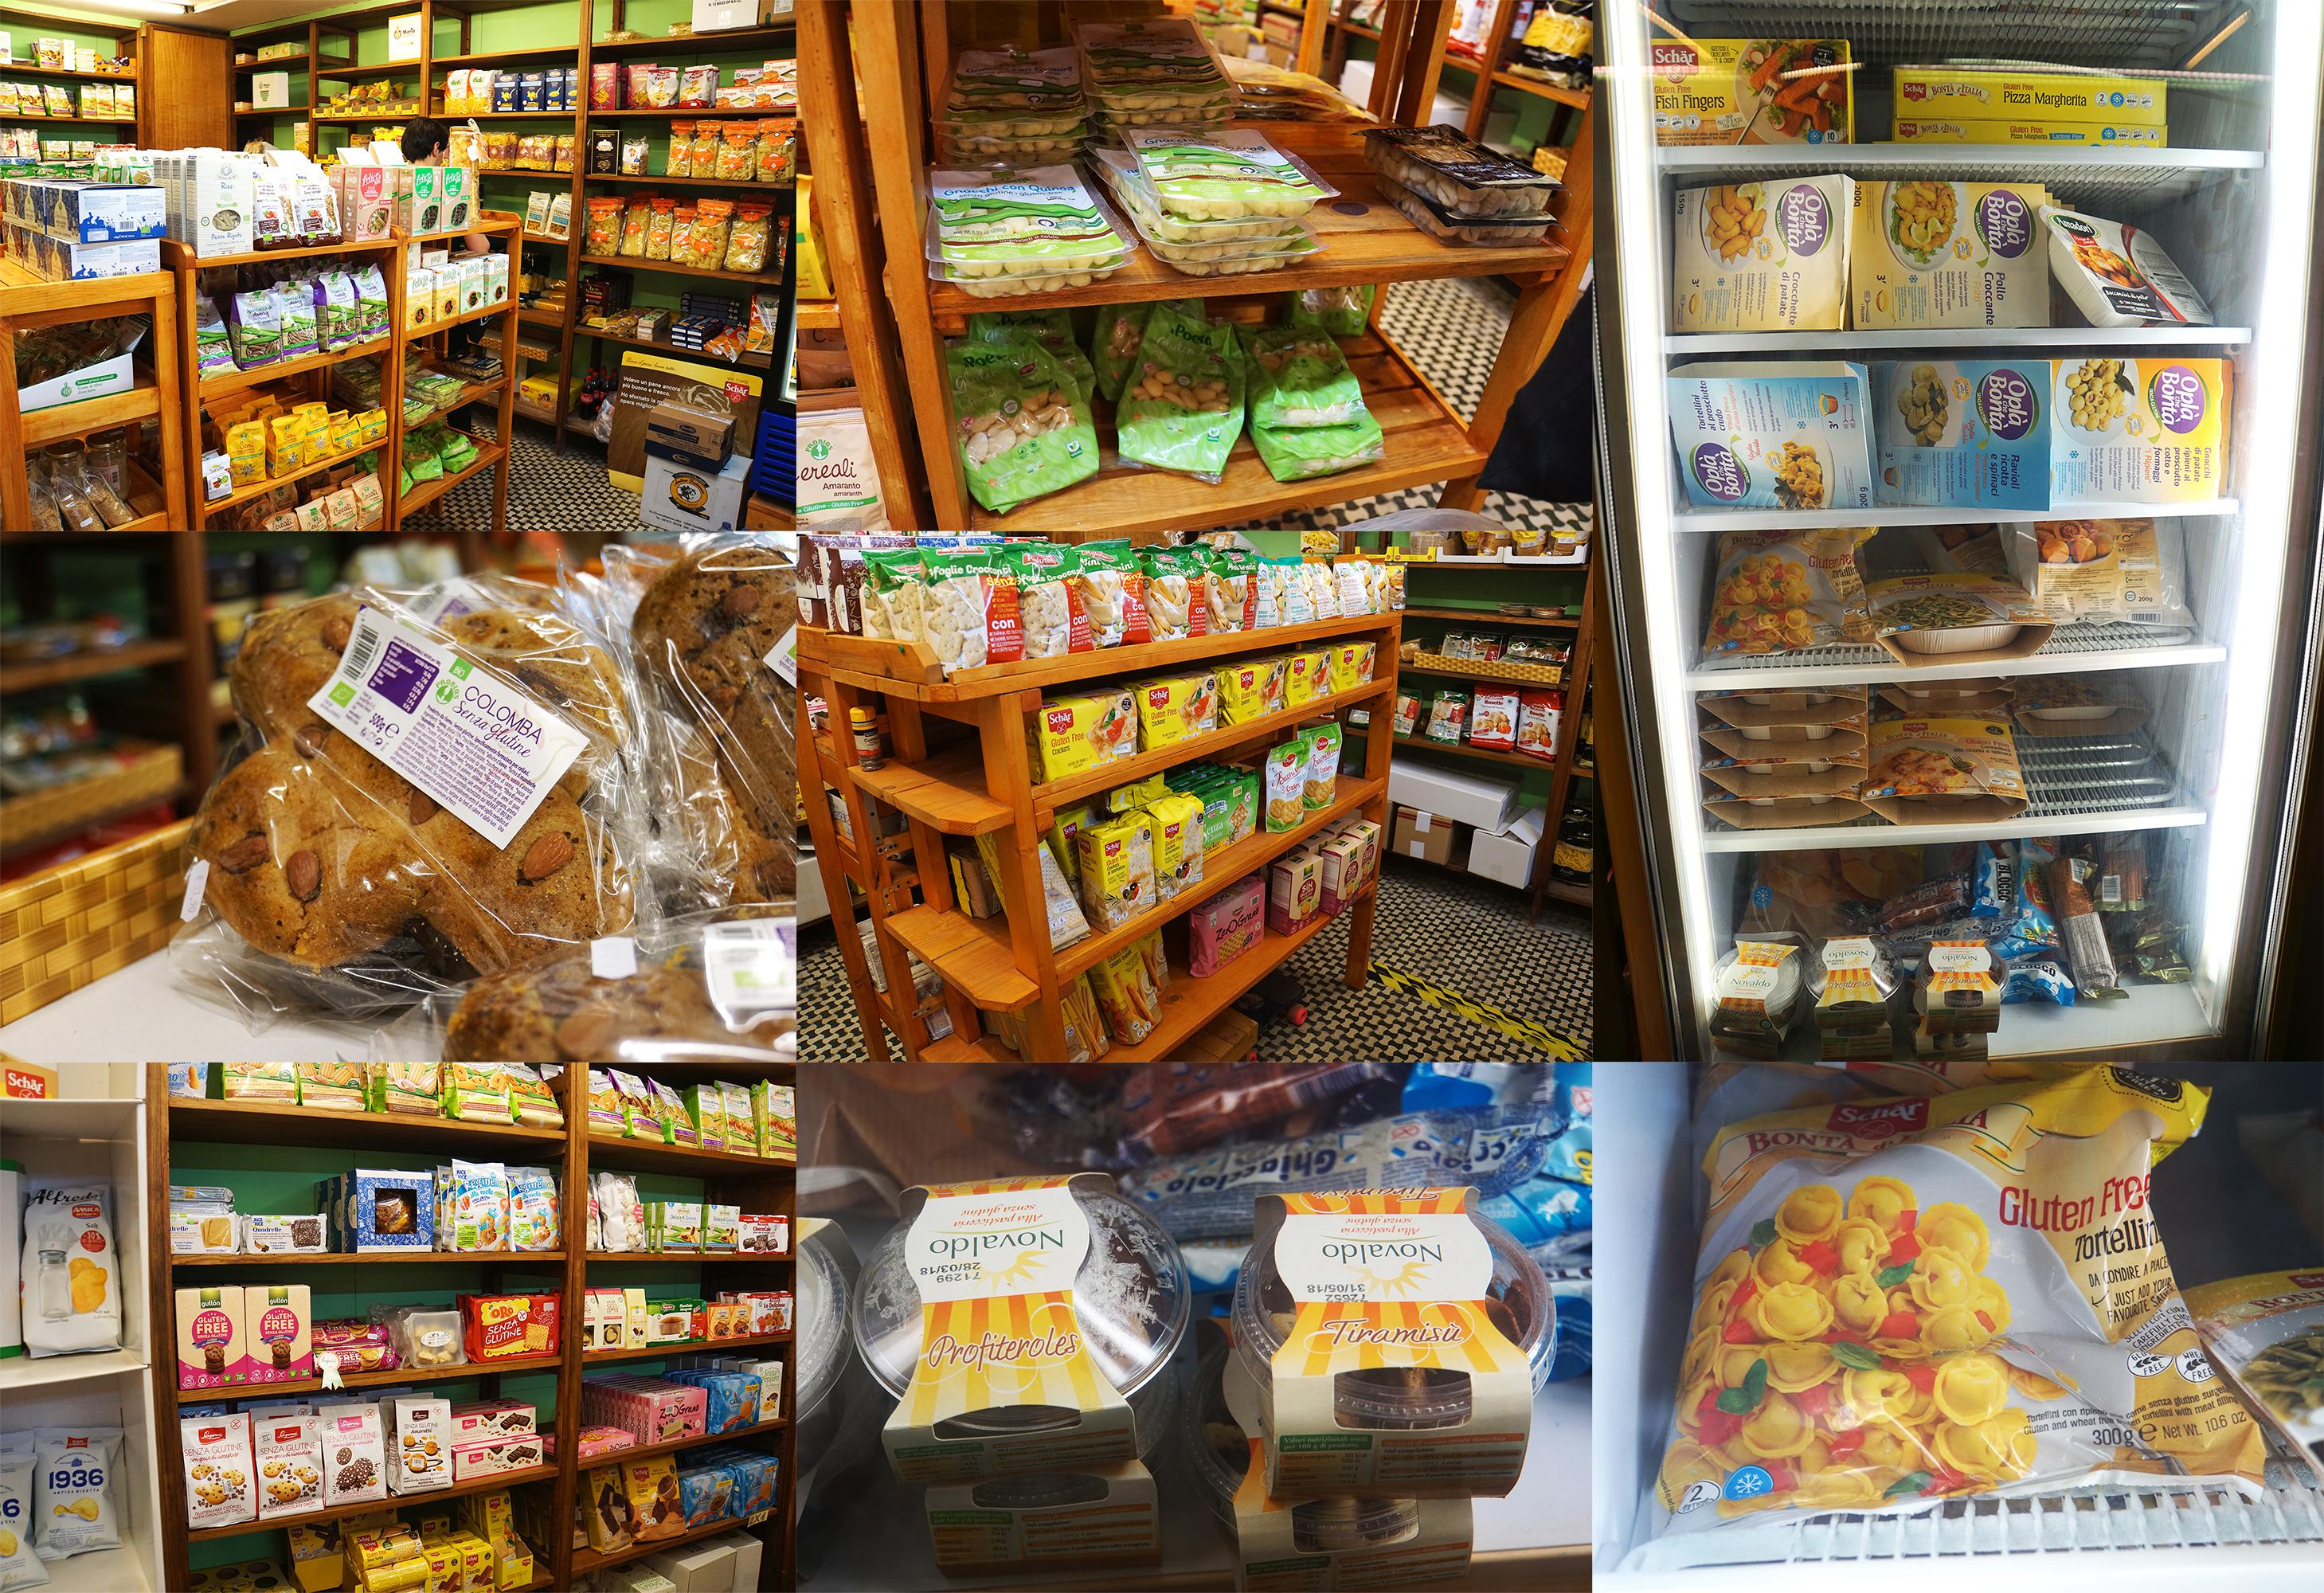 Mea Libera Tutti gluten free food - gluten free Venice guide